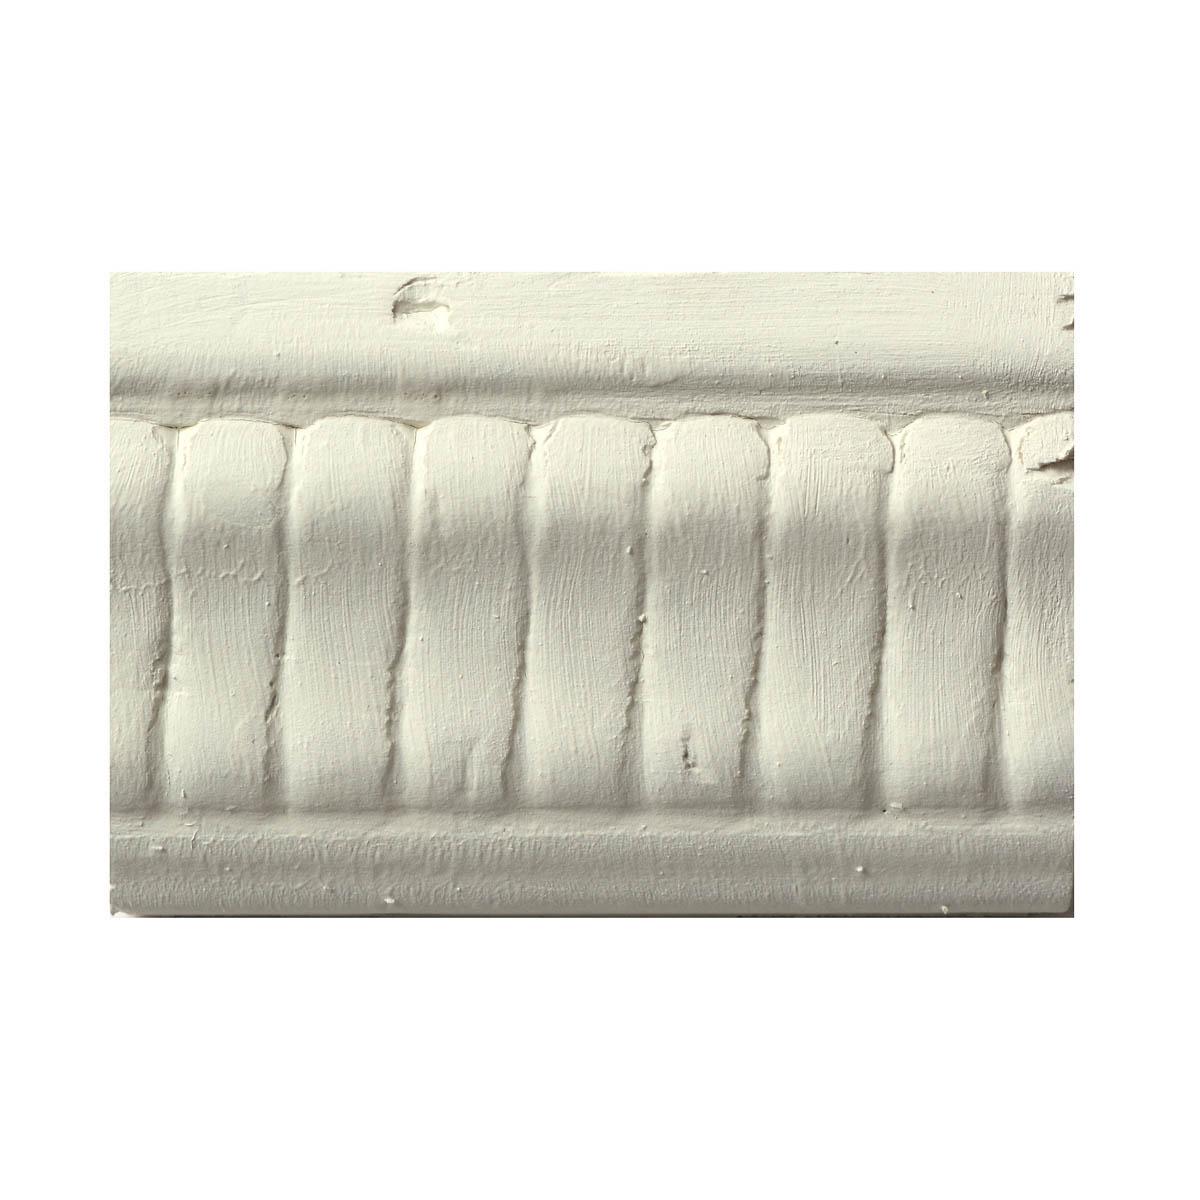 Waverly ® Inspirations Chalk Acrylic Paint - Plaster, 8 oz.